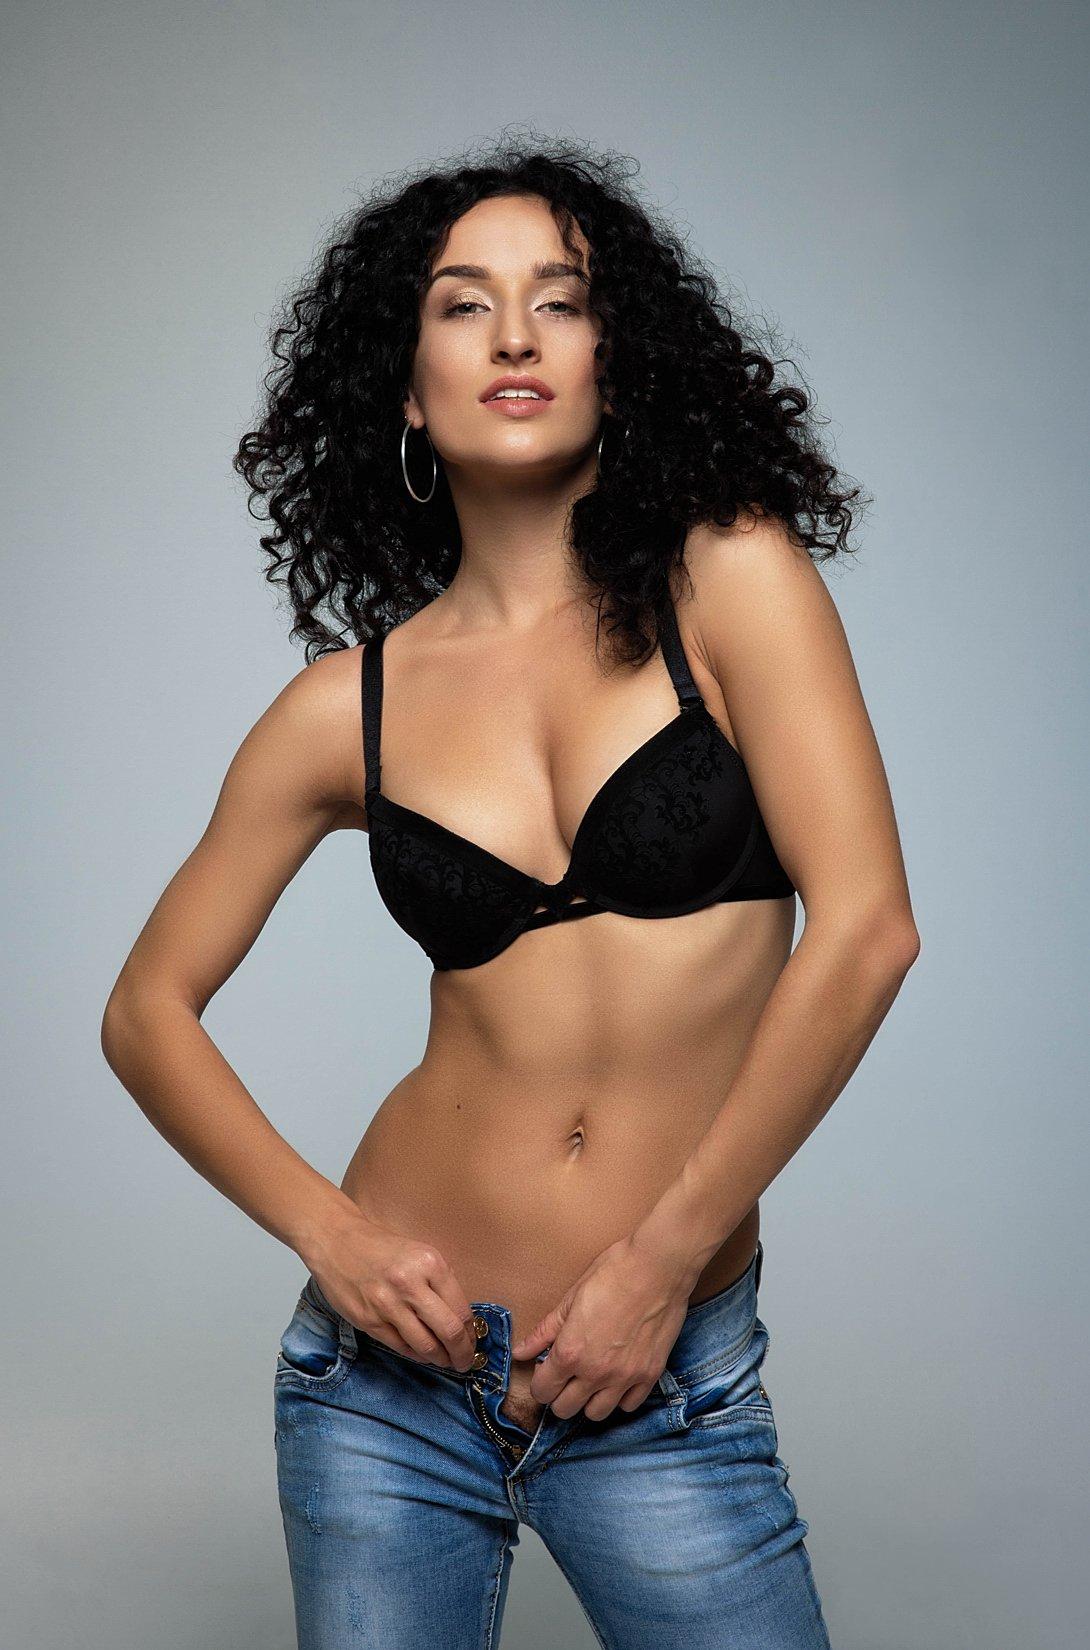 model, fine art, sexy, sensual, colour, woman, female, body, erotica, glamour, curves, portrait, beautiful, fashion, red lips, lingerie, fashion,, Lajos Csáki